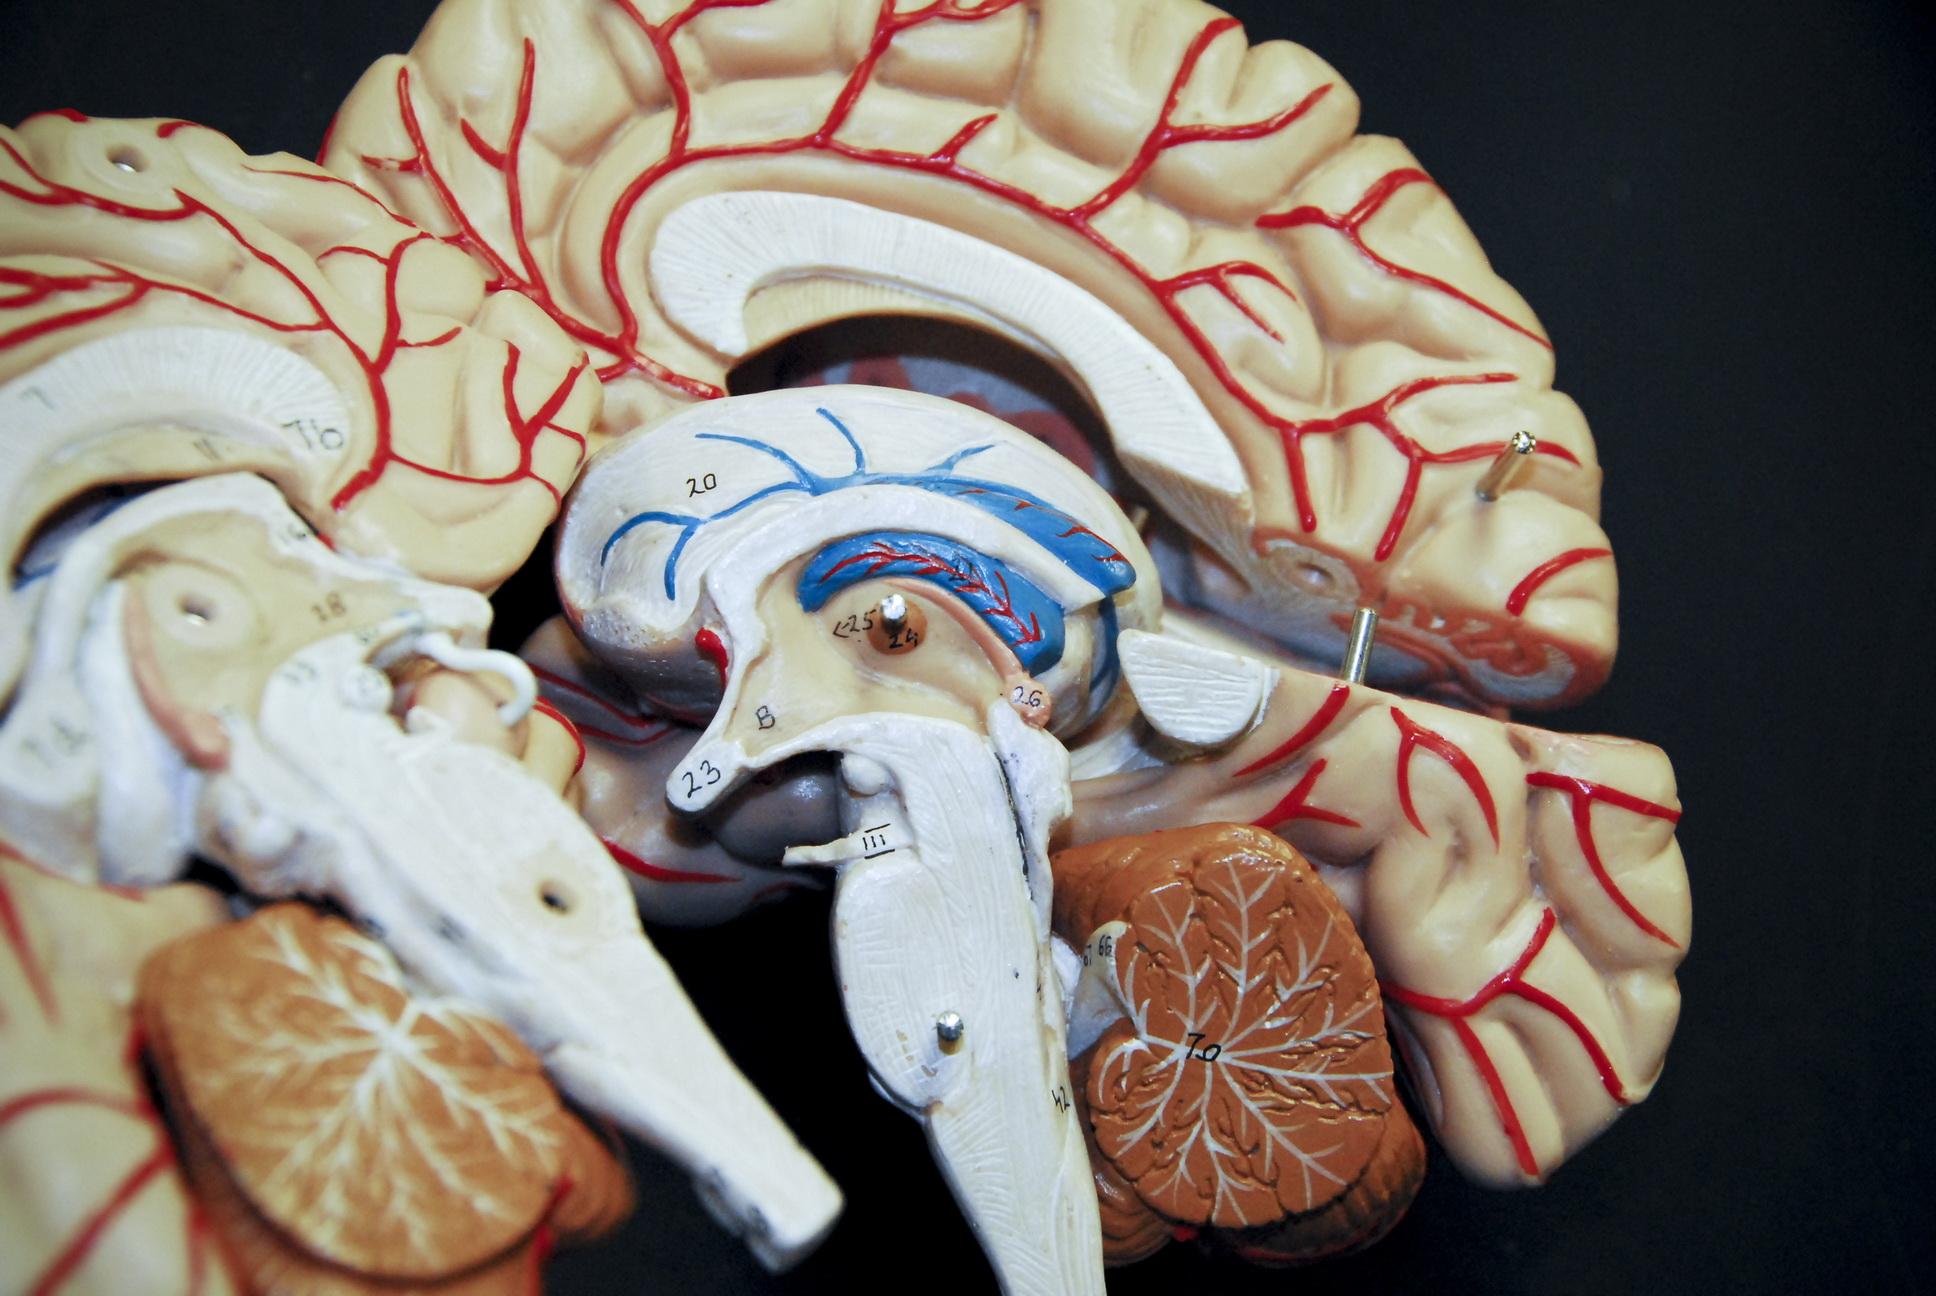 Brain model - STAT